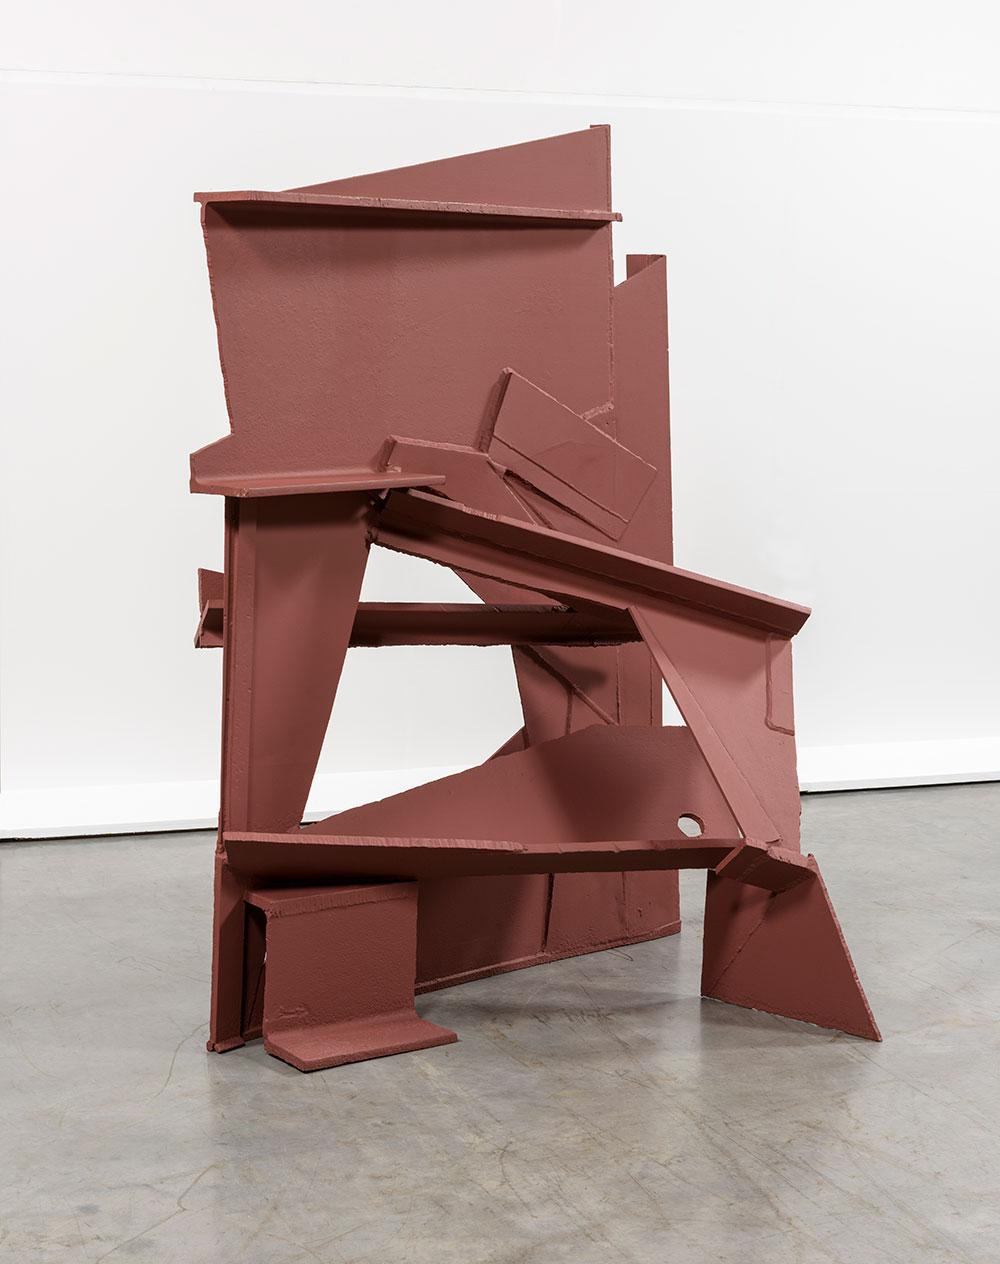 Anthony Caro sculpture - Straight On